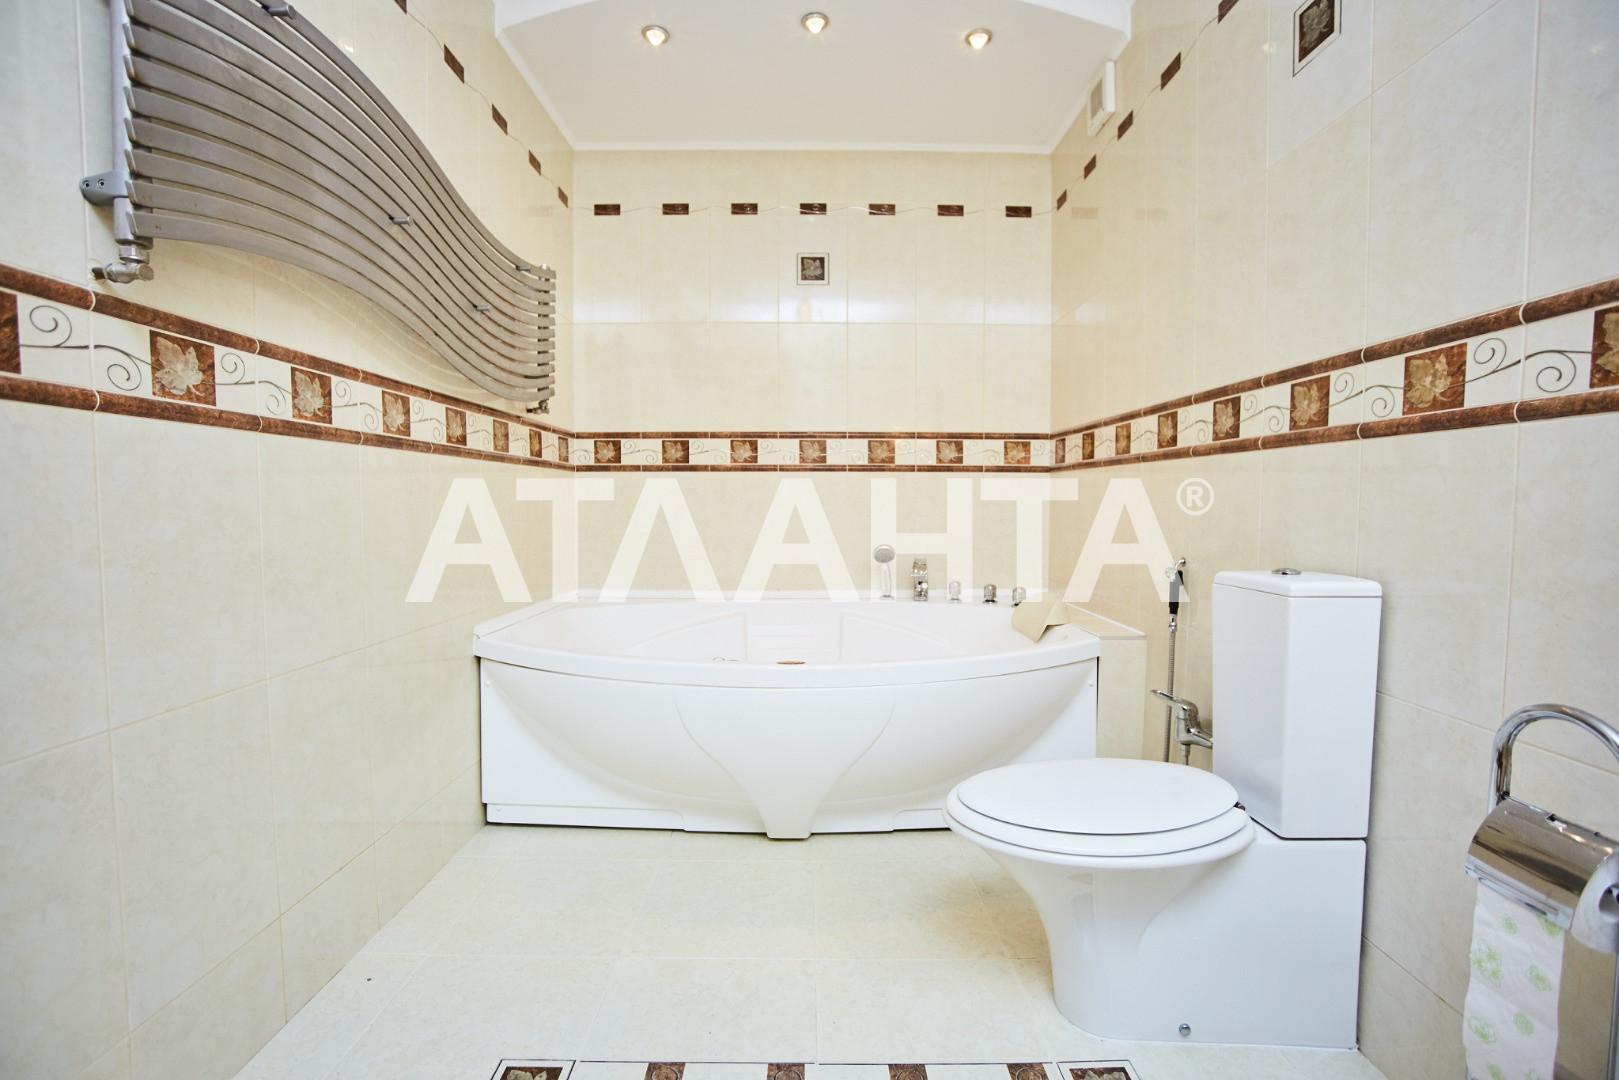 Продается Многоуровневая Квартира на ул. Посмитного — 295 000 у.е. (фото №23)